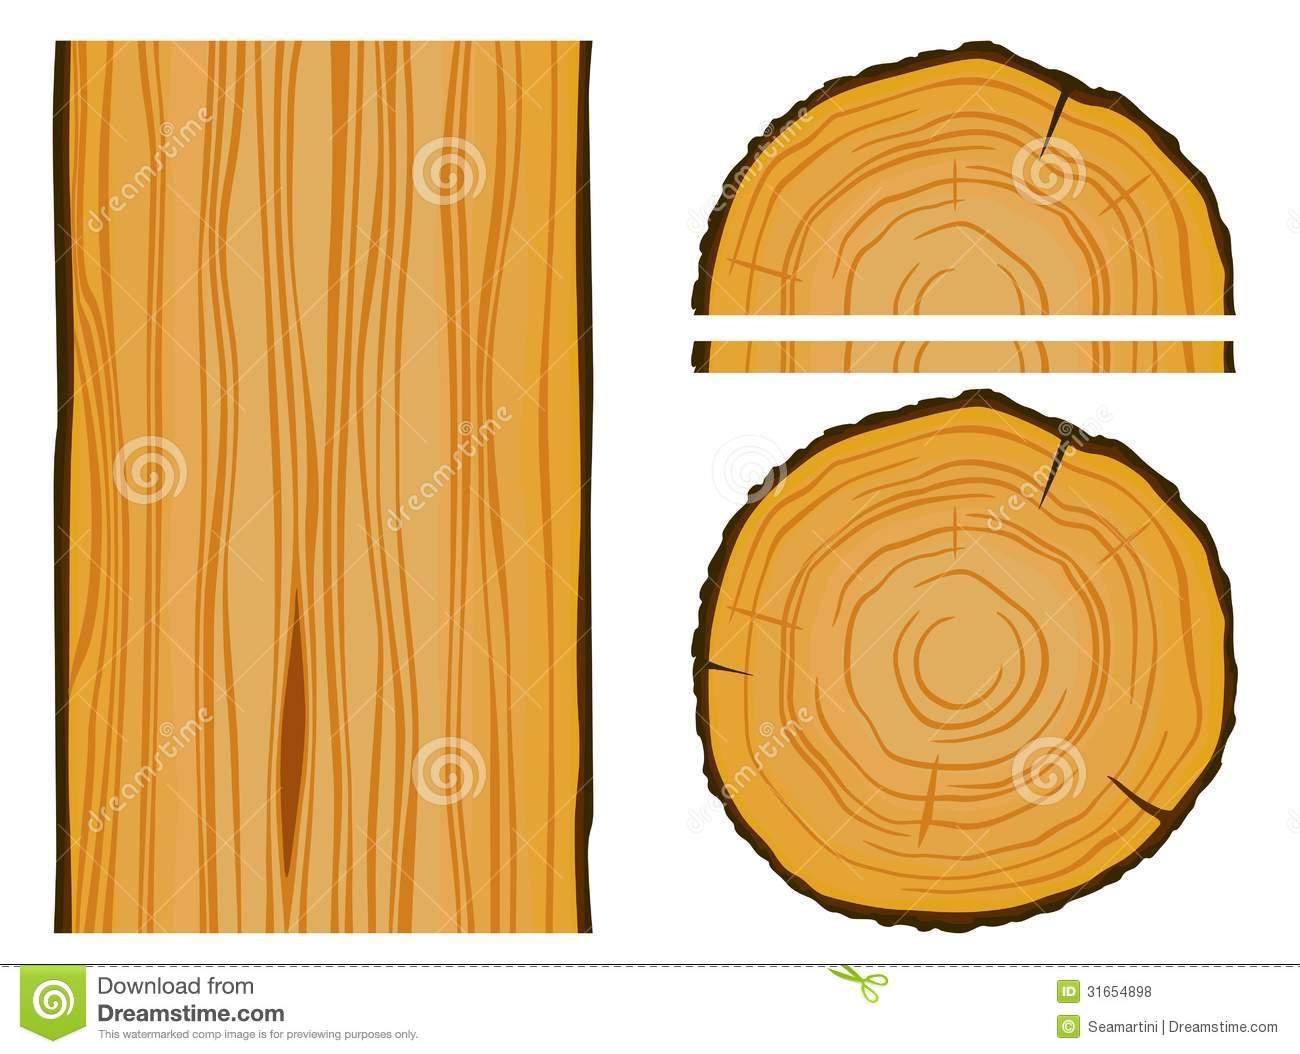 1300x1054 Wooden Texture Log Clipart, Explore Pictures